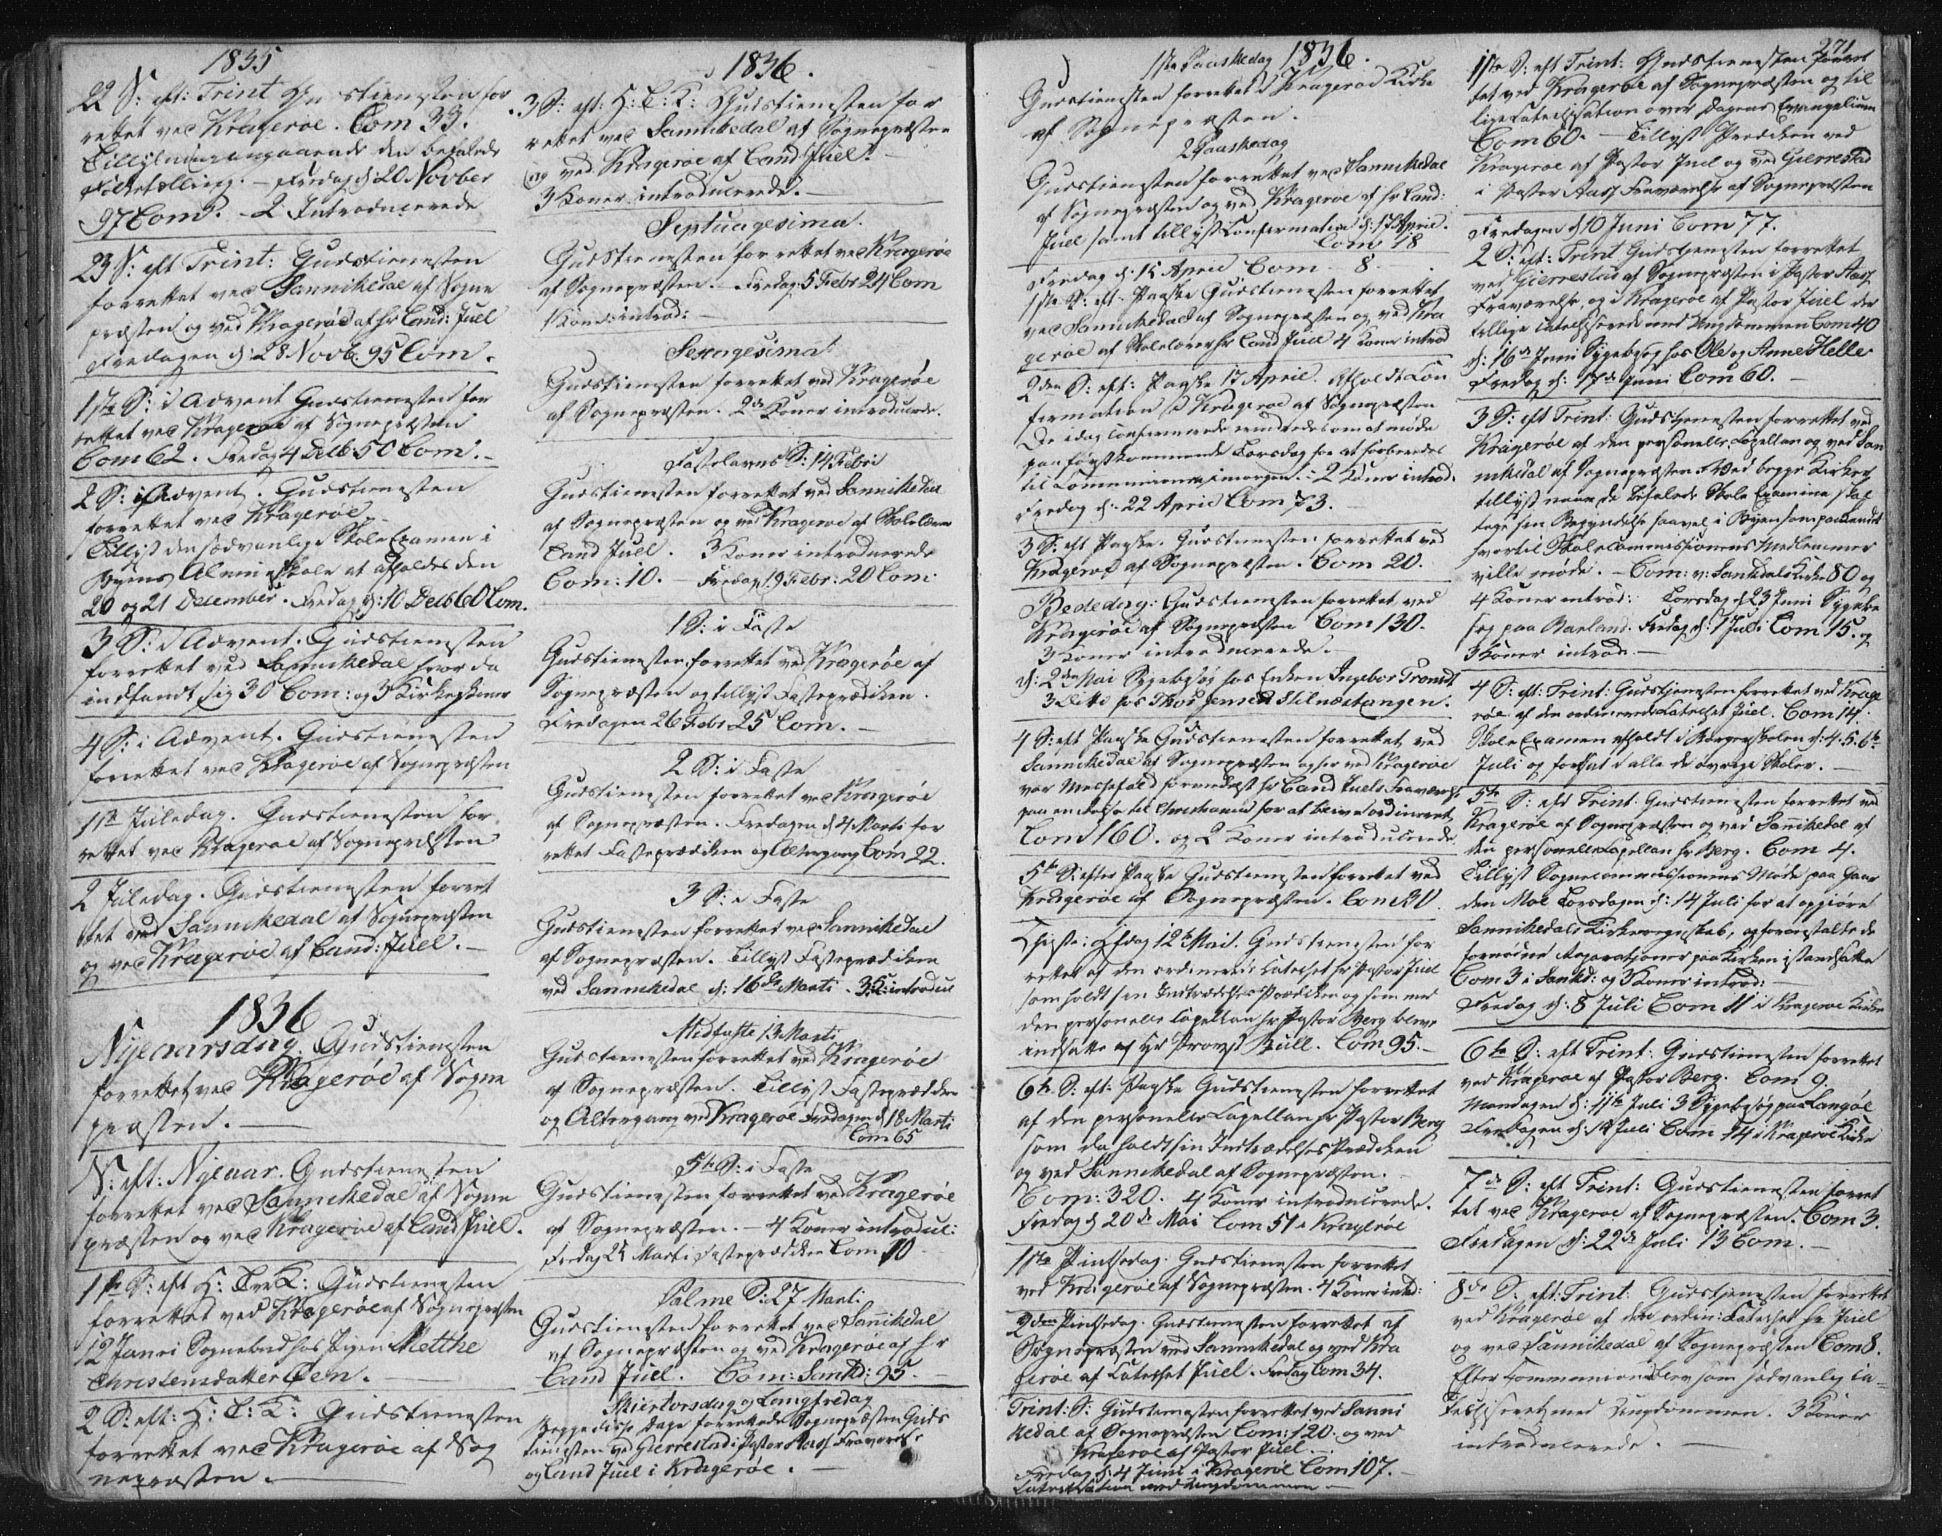 SAKO, Kragerø kirkebøker, F/Fa/L0005: Ministerialbok nr. 5, 1832-1847, s. 271